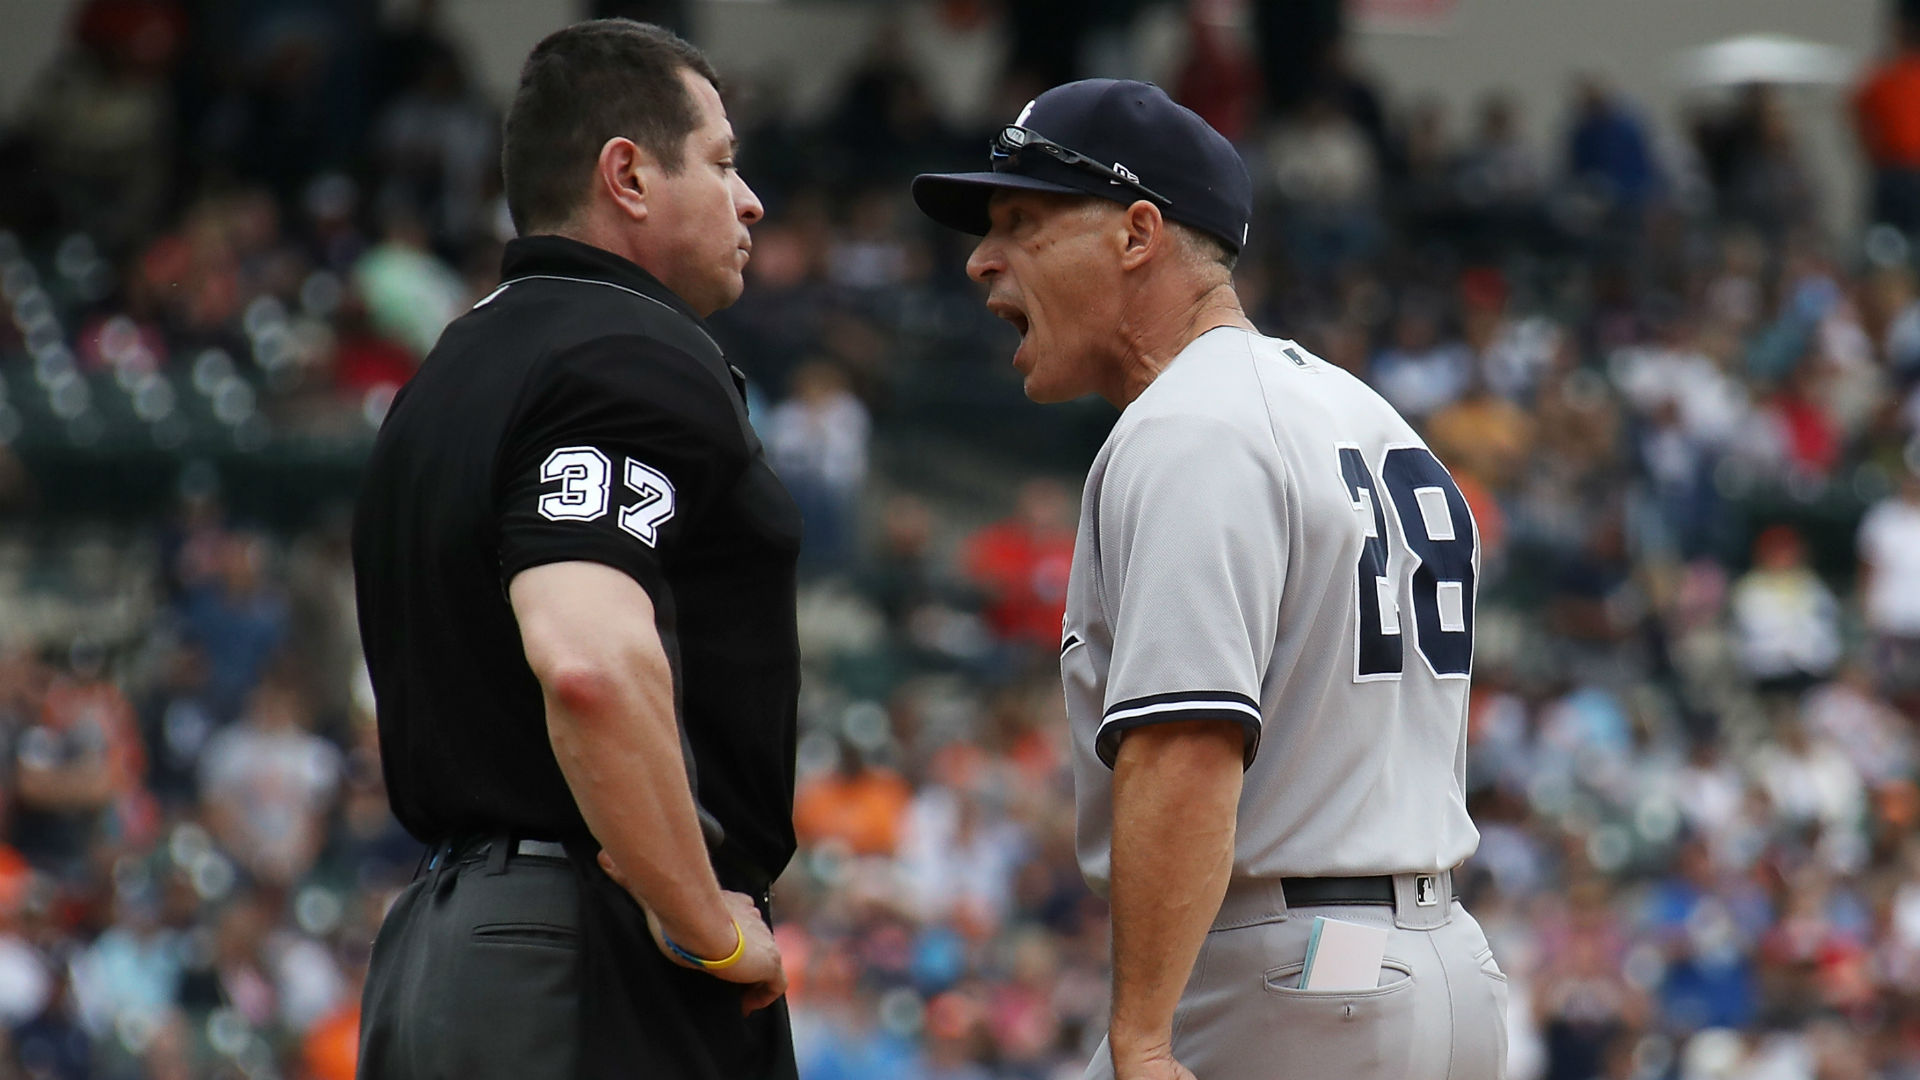 Yankees-manager-joe-girardi_4asxcq1g651n1nbvfcayz625x